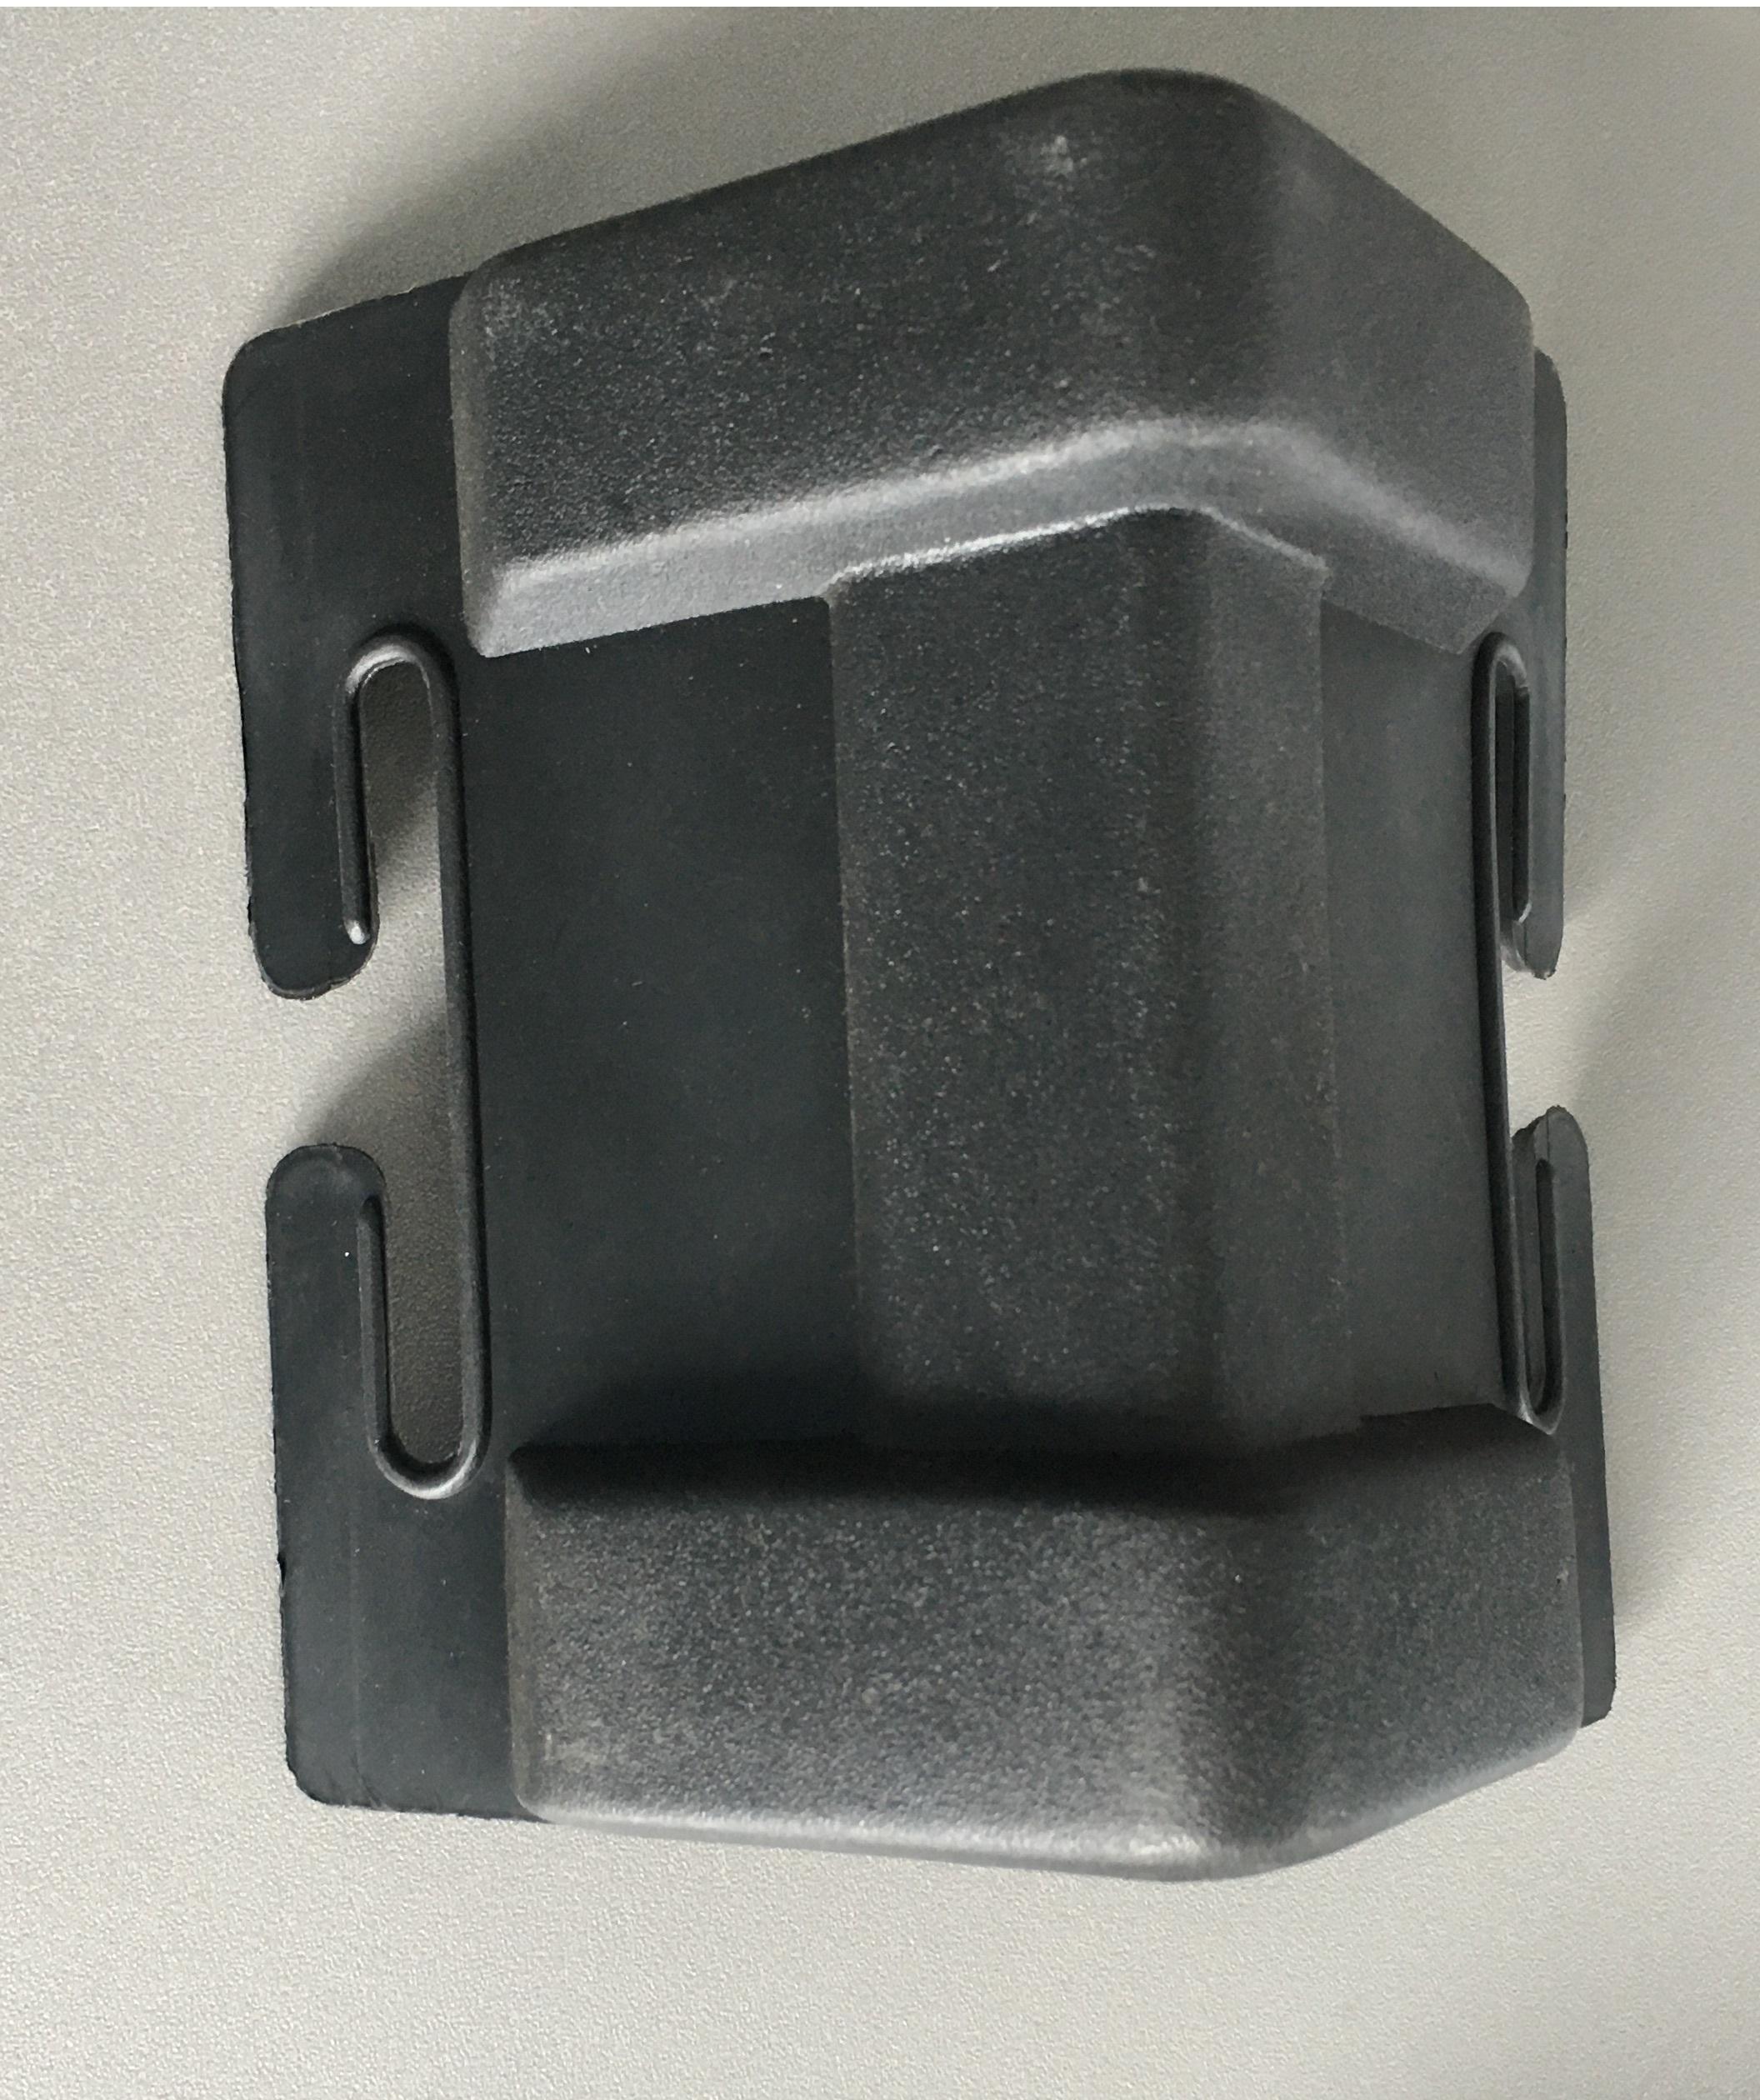 Ochranný roh 100 x100 mm černý, KPM černý B/N